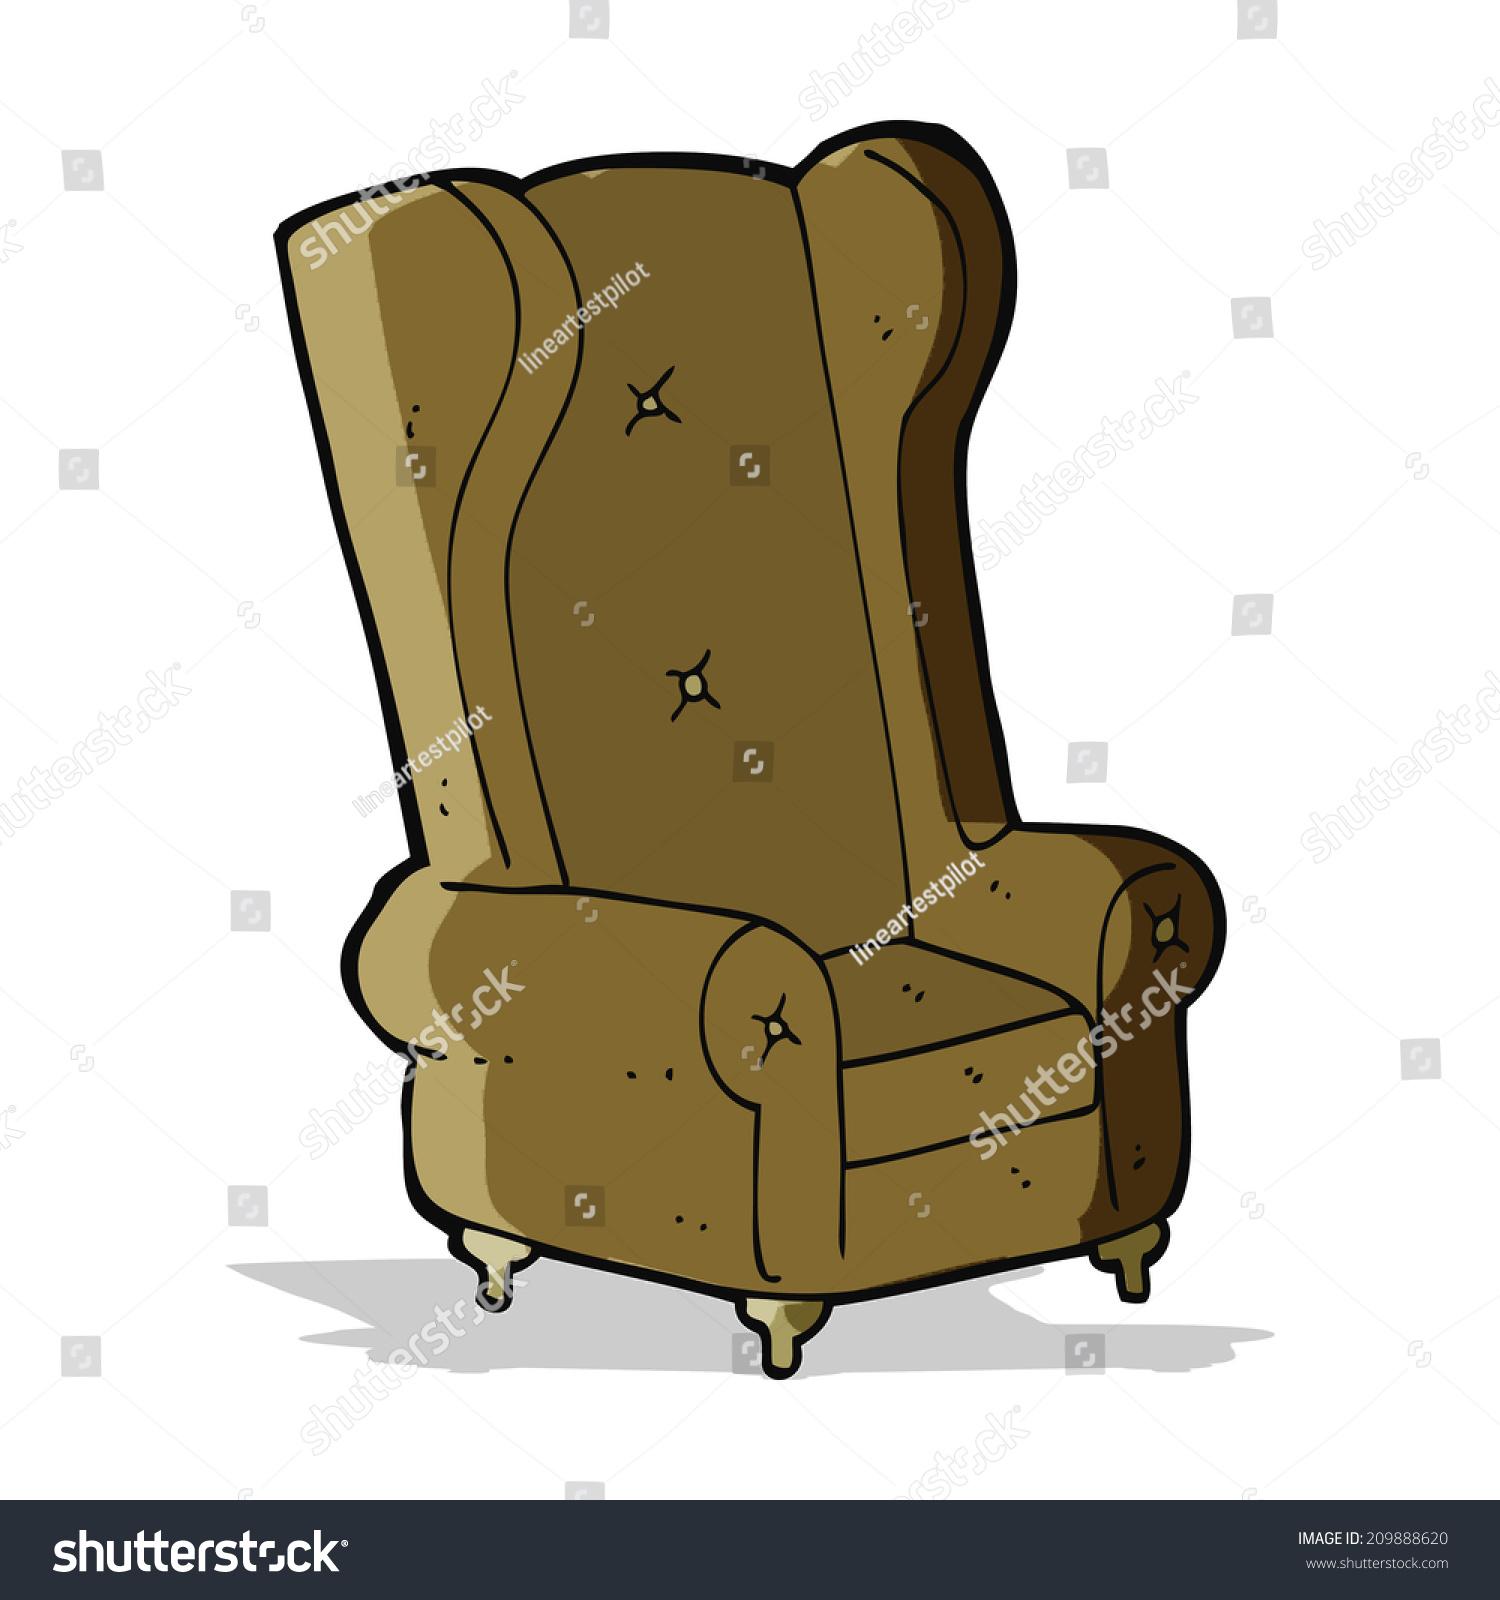 Cartoon Old Armchair Stock Vector 209888620 - Shutterstock